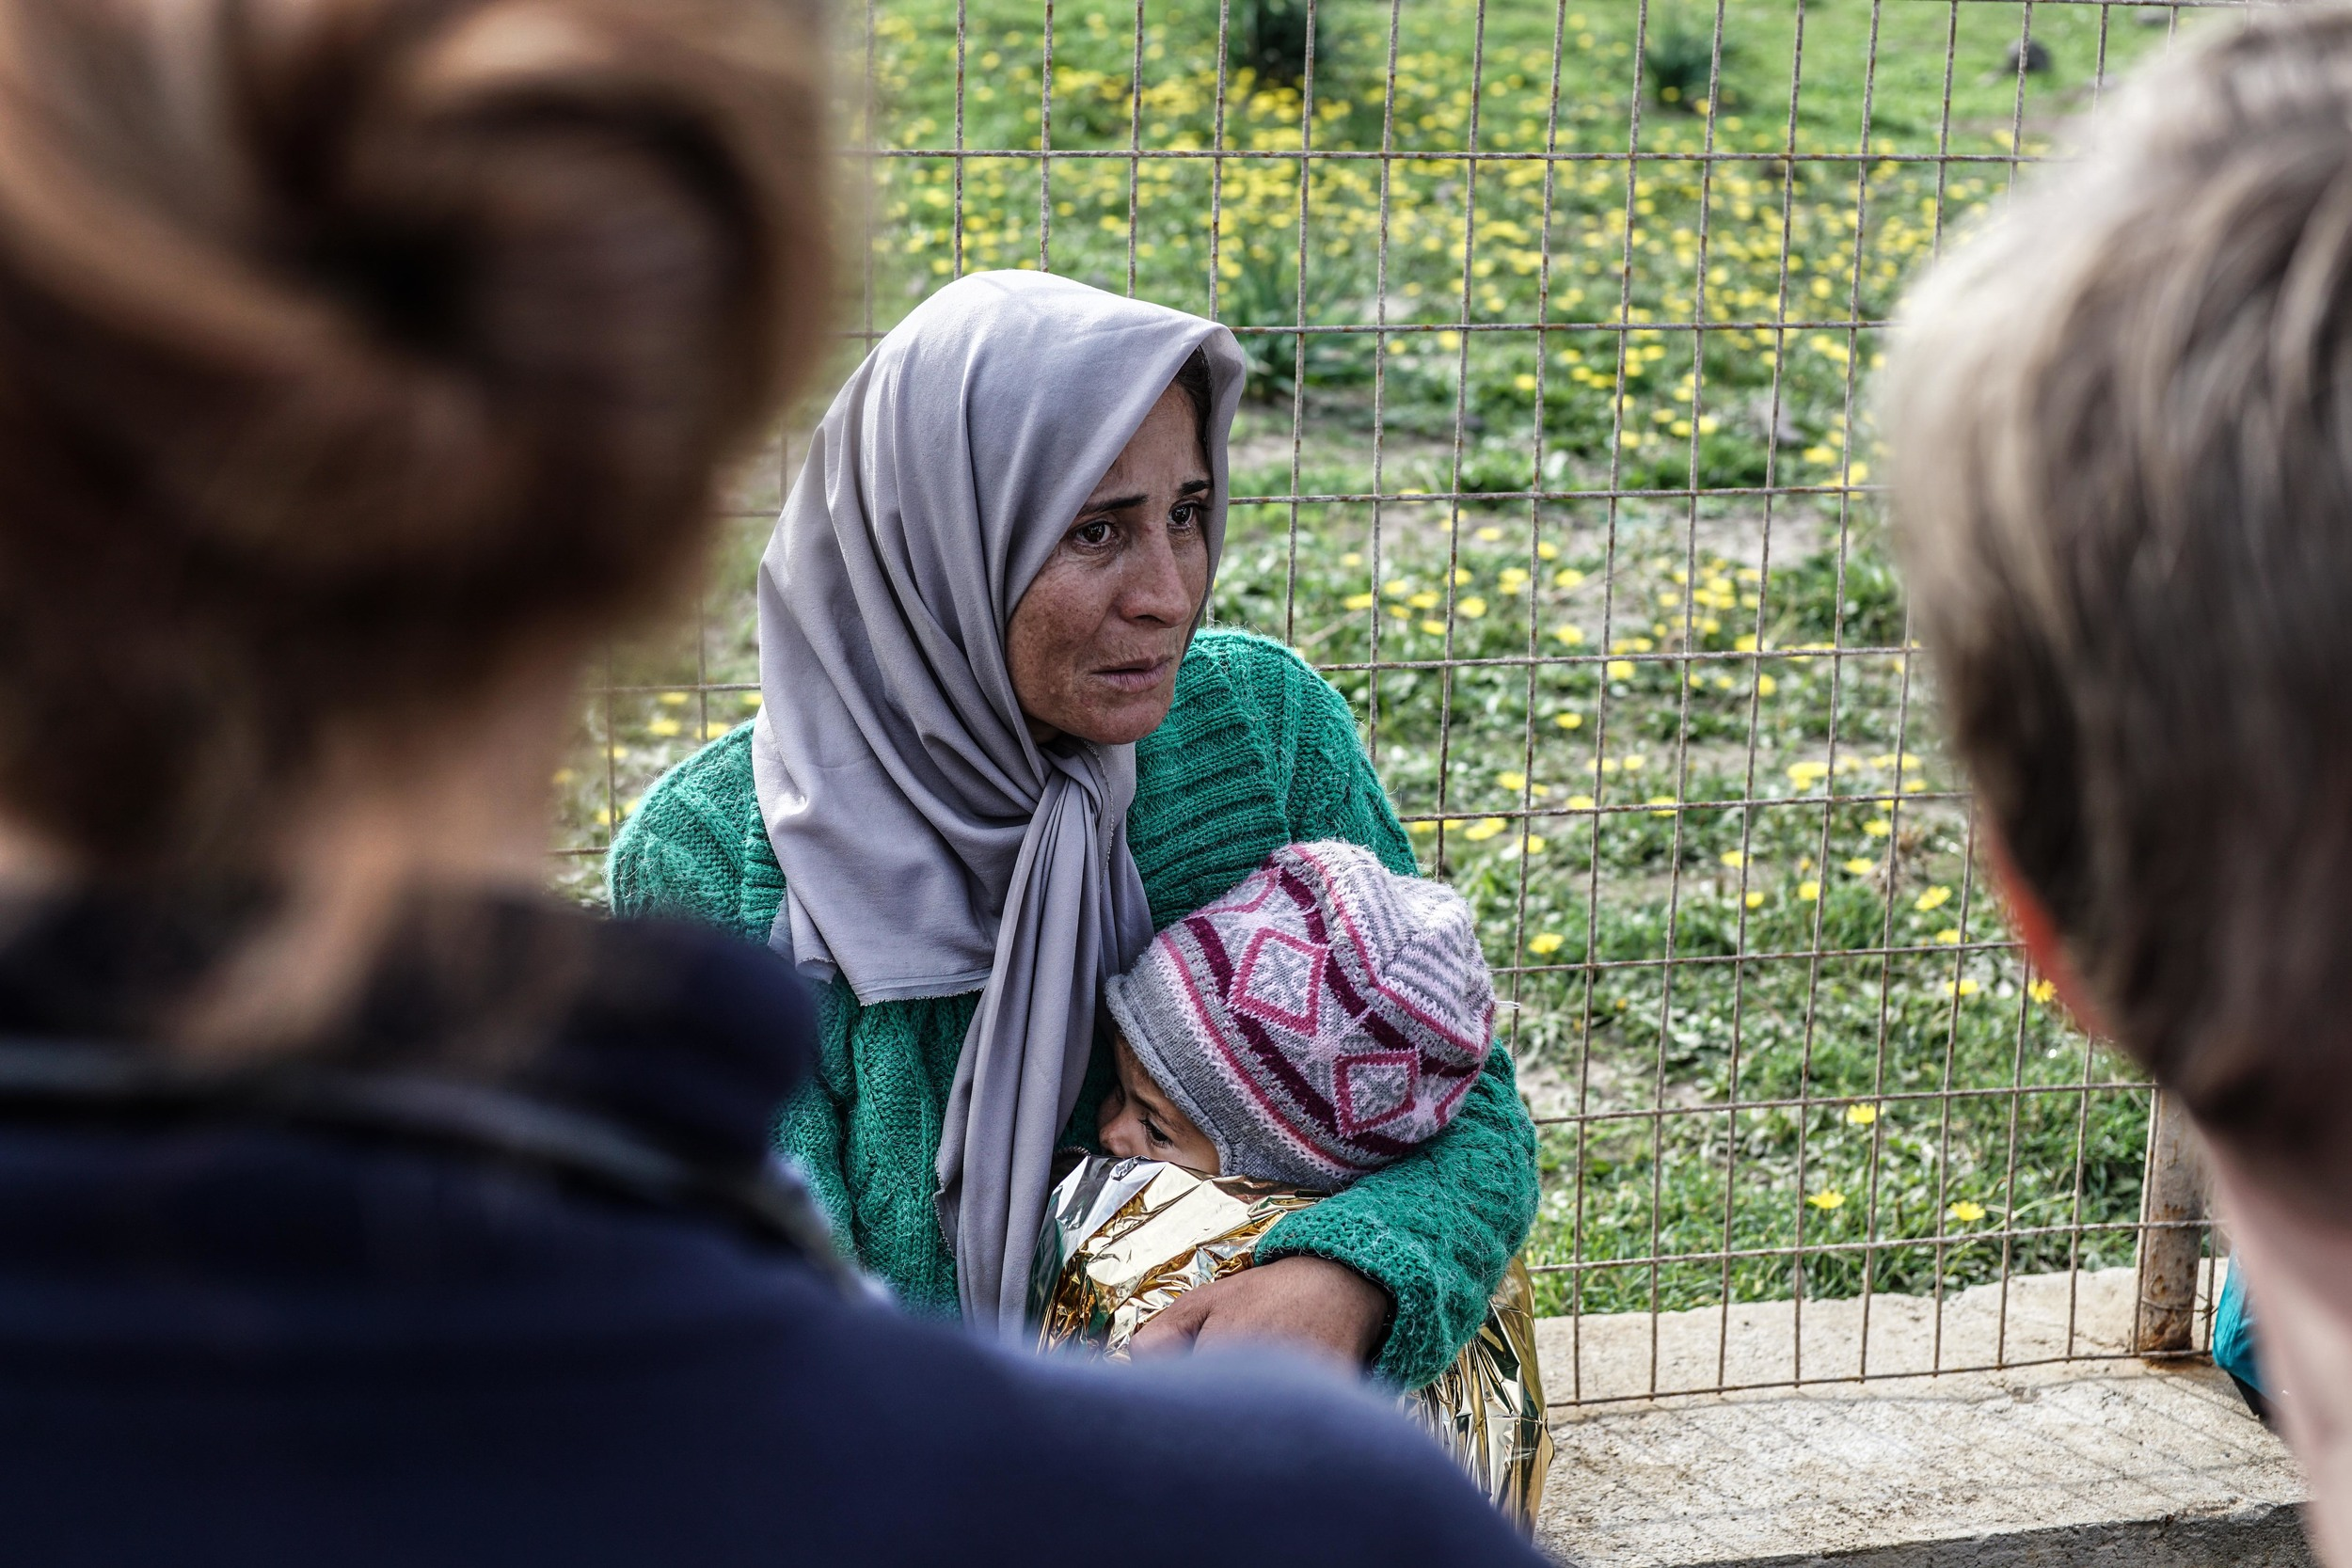 Syrian Refugee Crisis Lesbos Greece November 2015 8.jpg